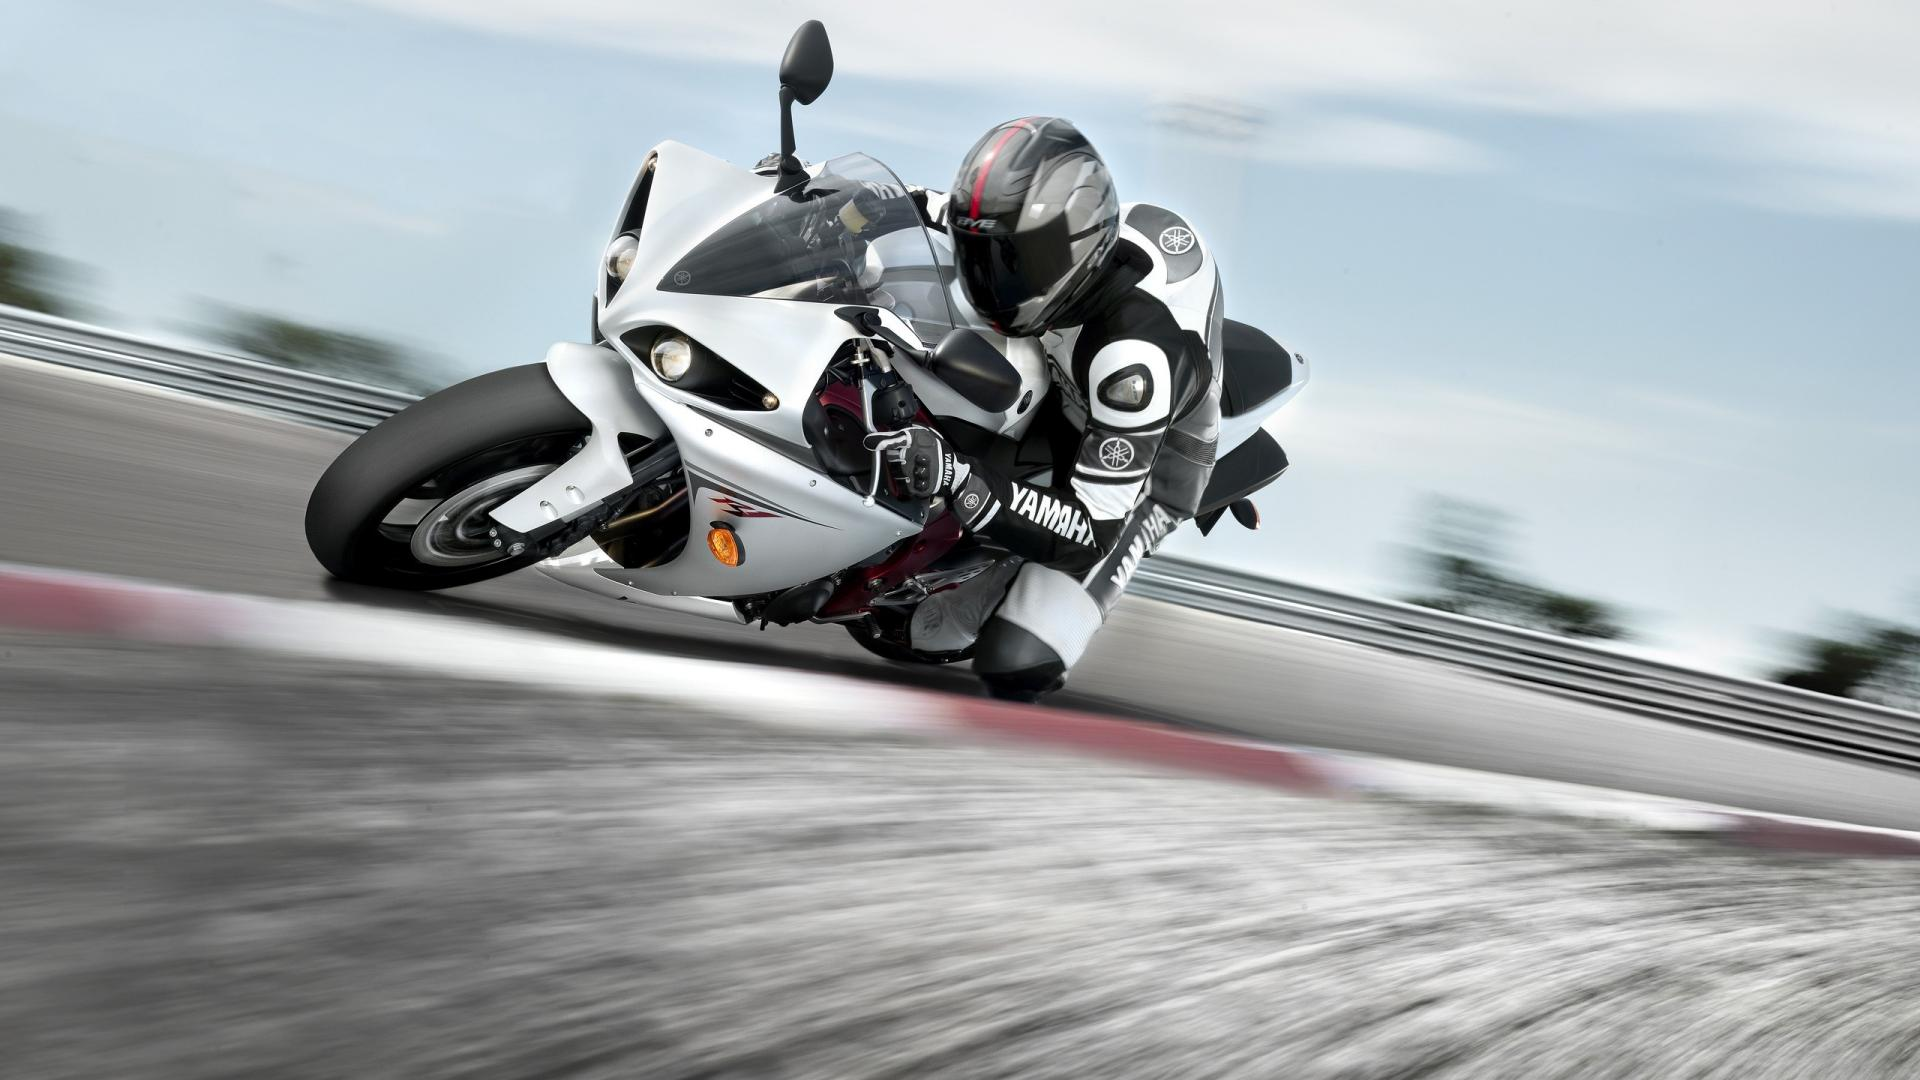 ... ghost_rider_bike_w1 HD motorcycle wallpaper 1 ...